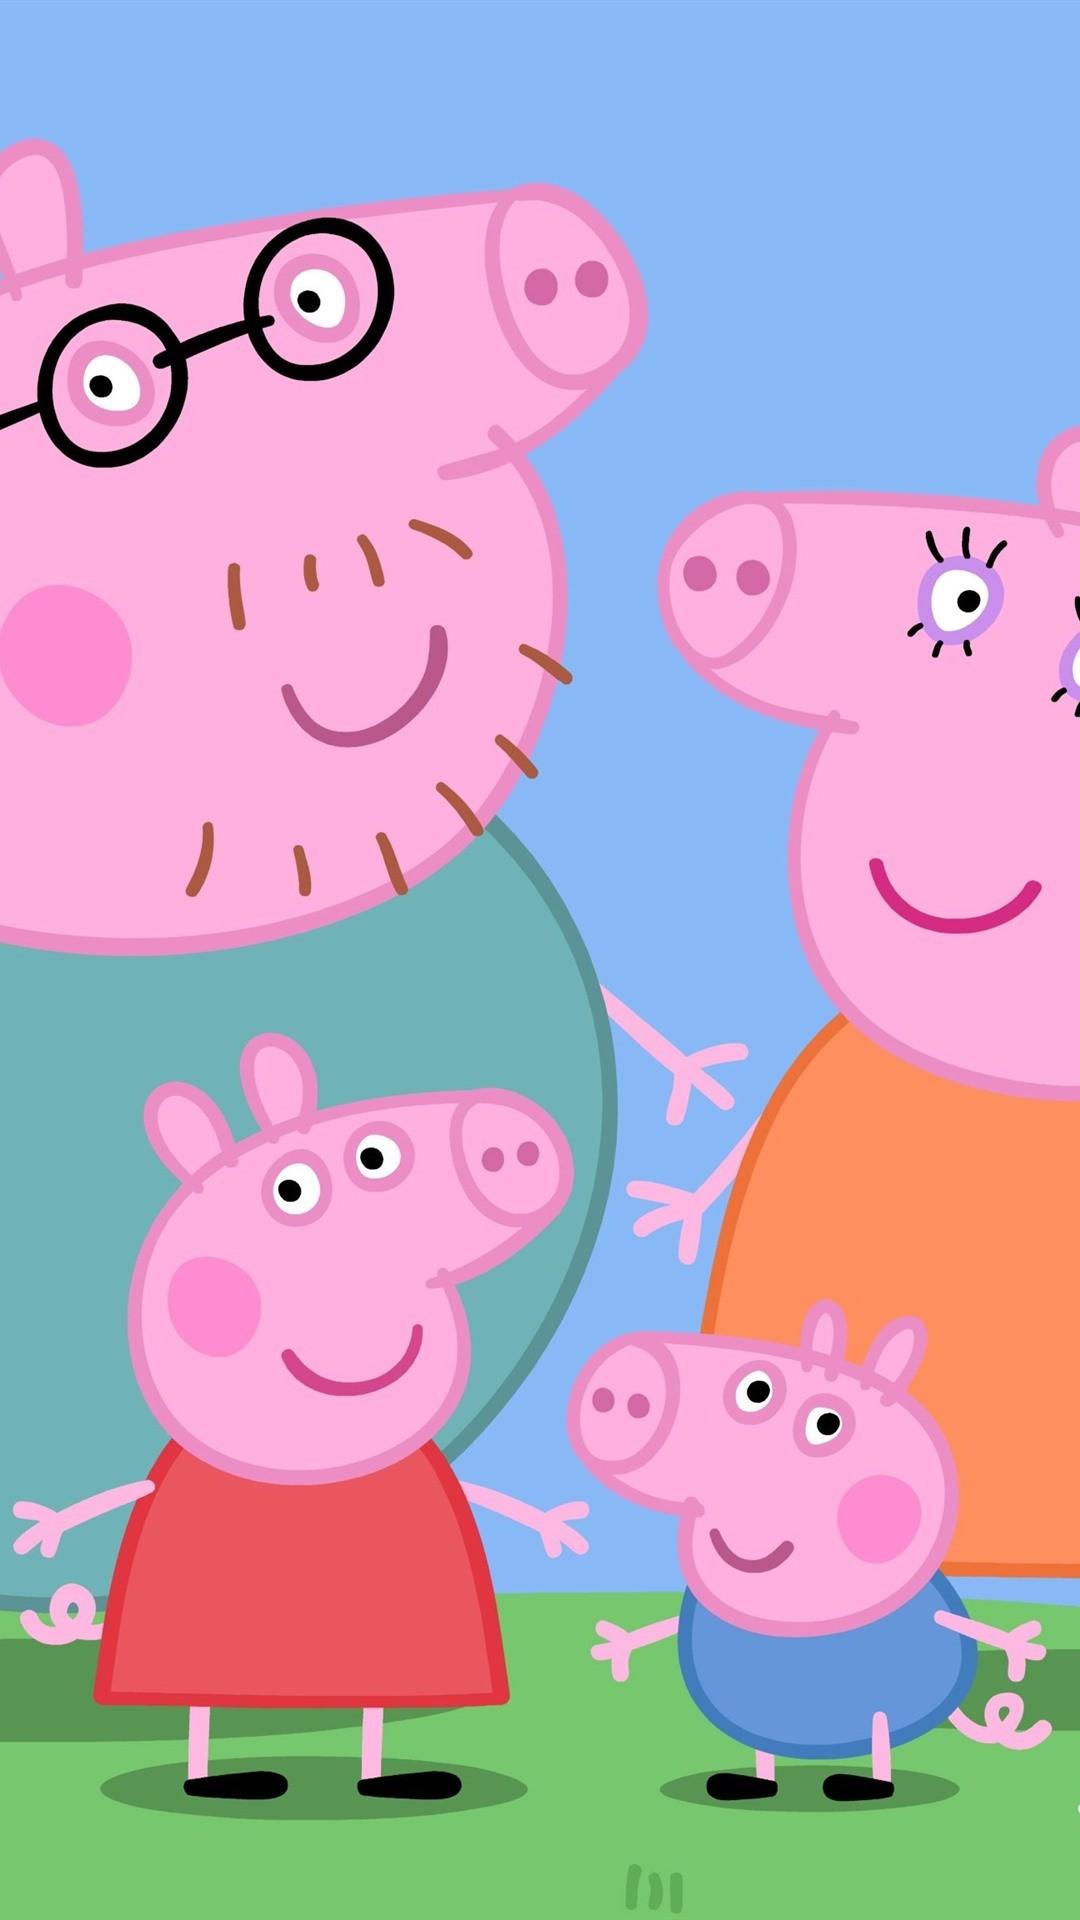 Hd Peppa Pig House Wallpaper Enwallpaper